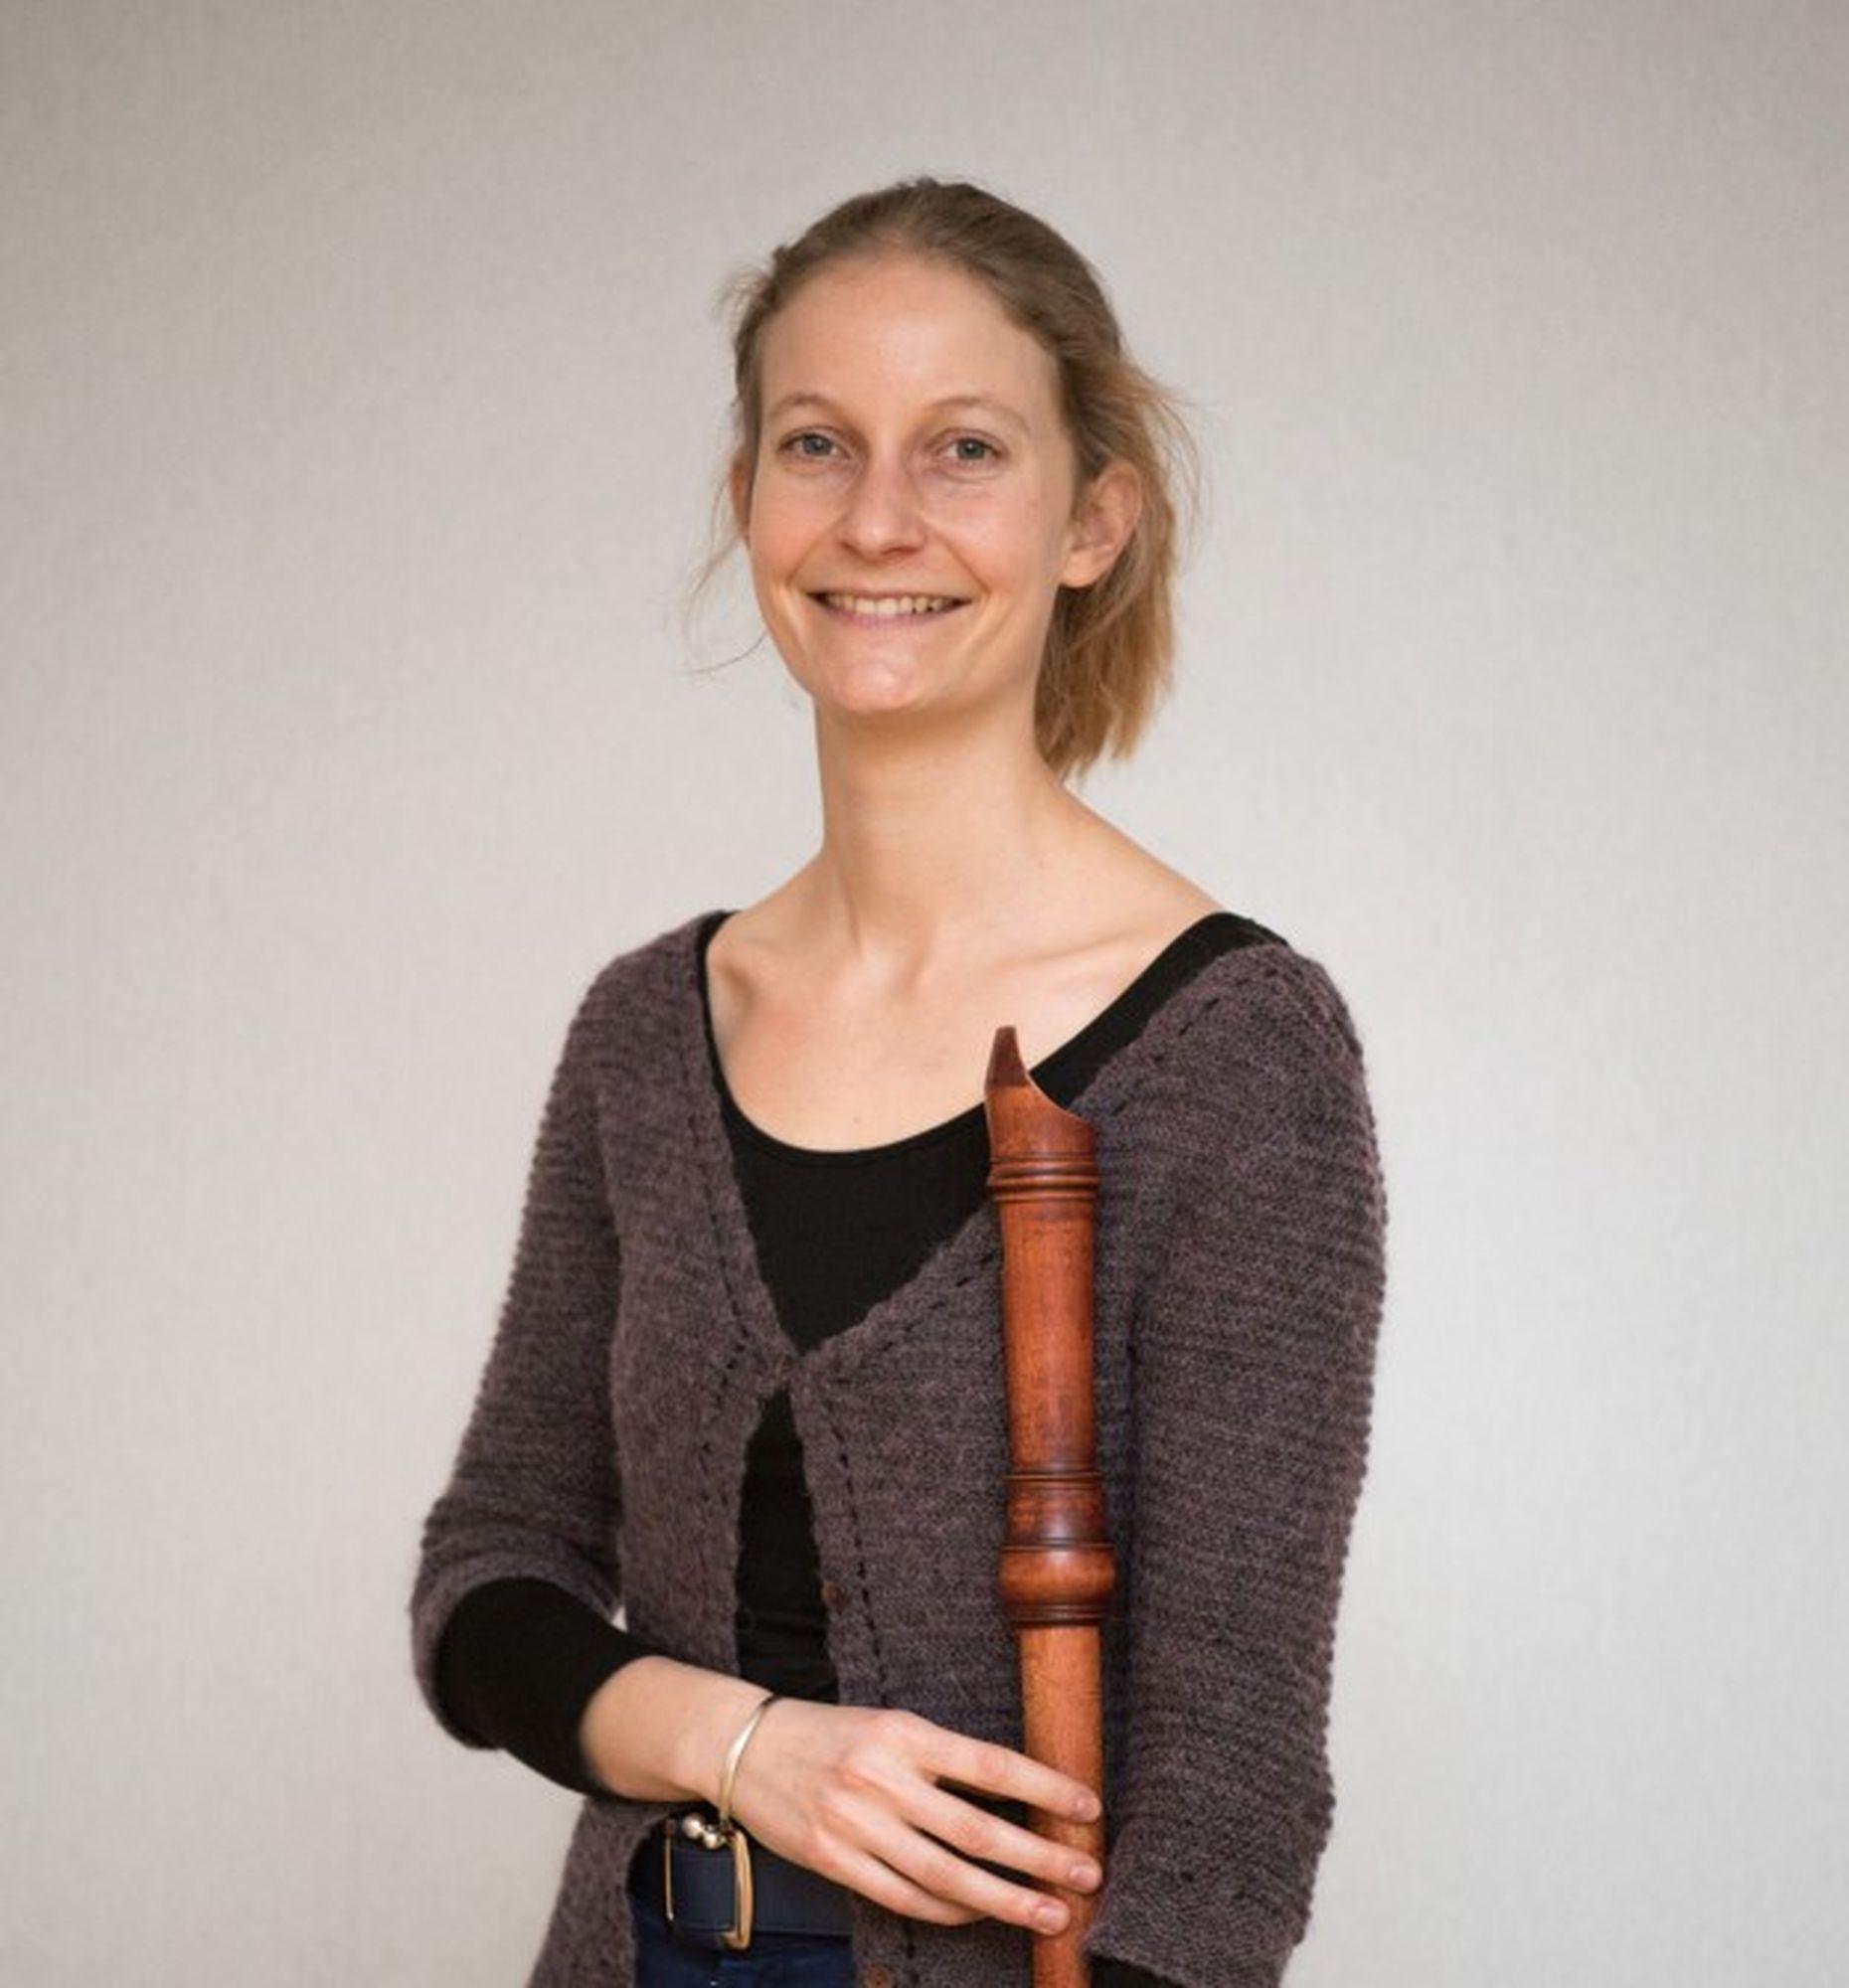 Rachel Heymans